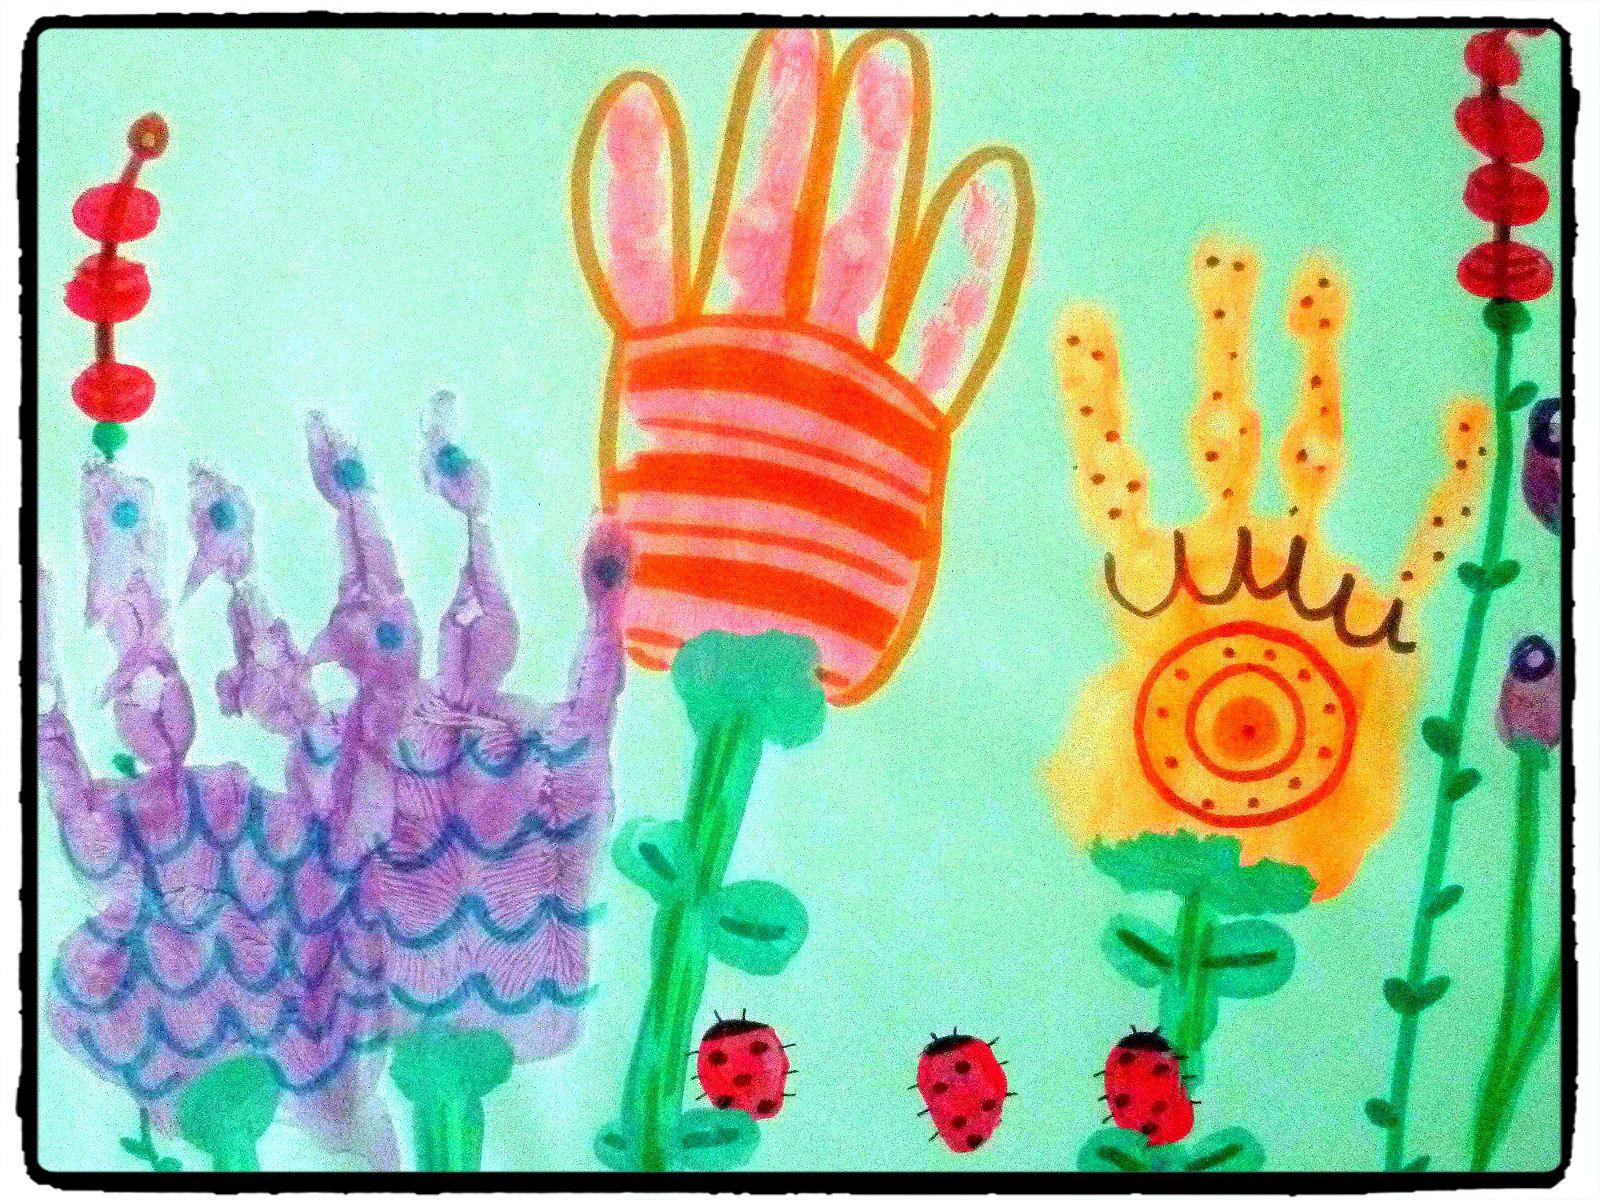 fleurs t printemps empreintes de mains peinture. Black Bedroom Furniture Sets. Home Design Ideas